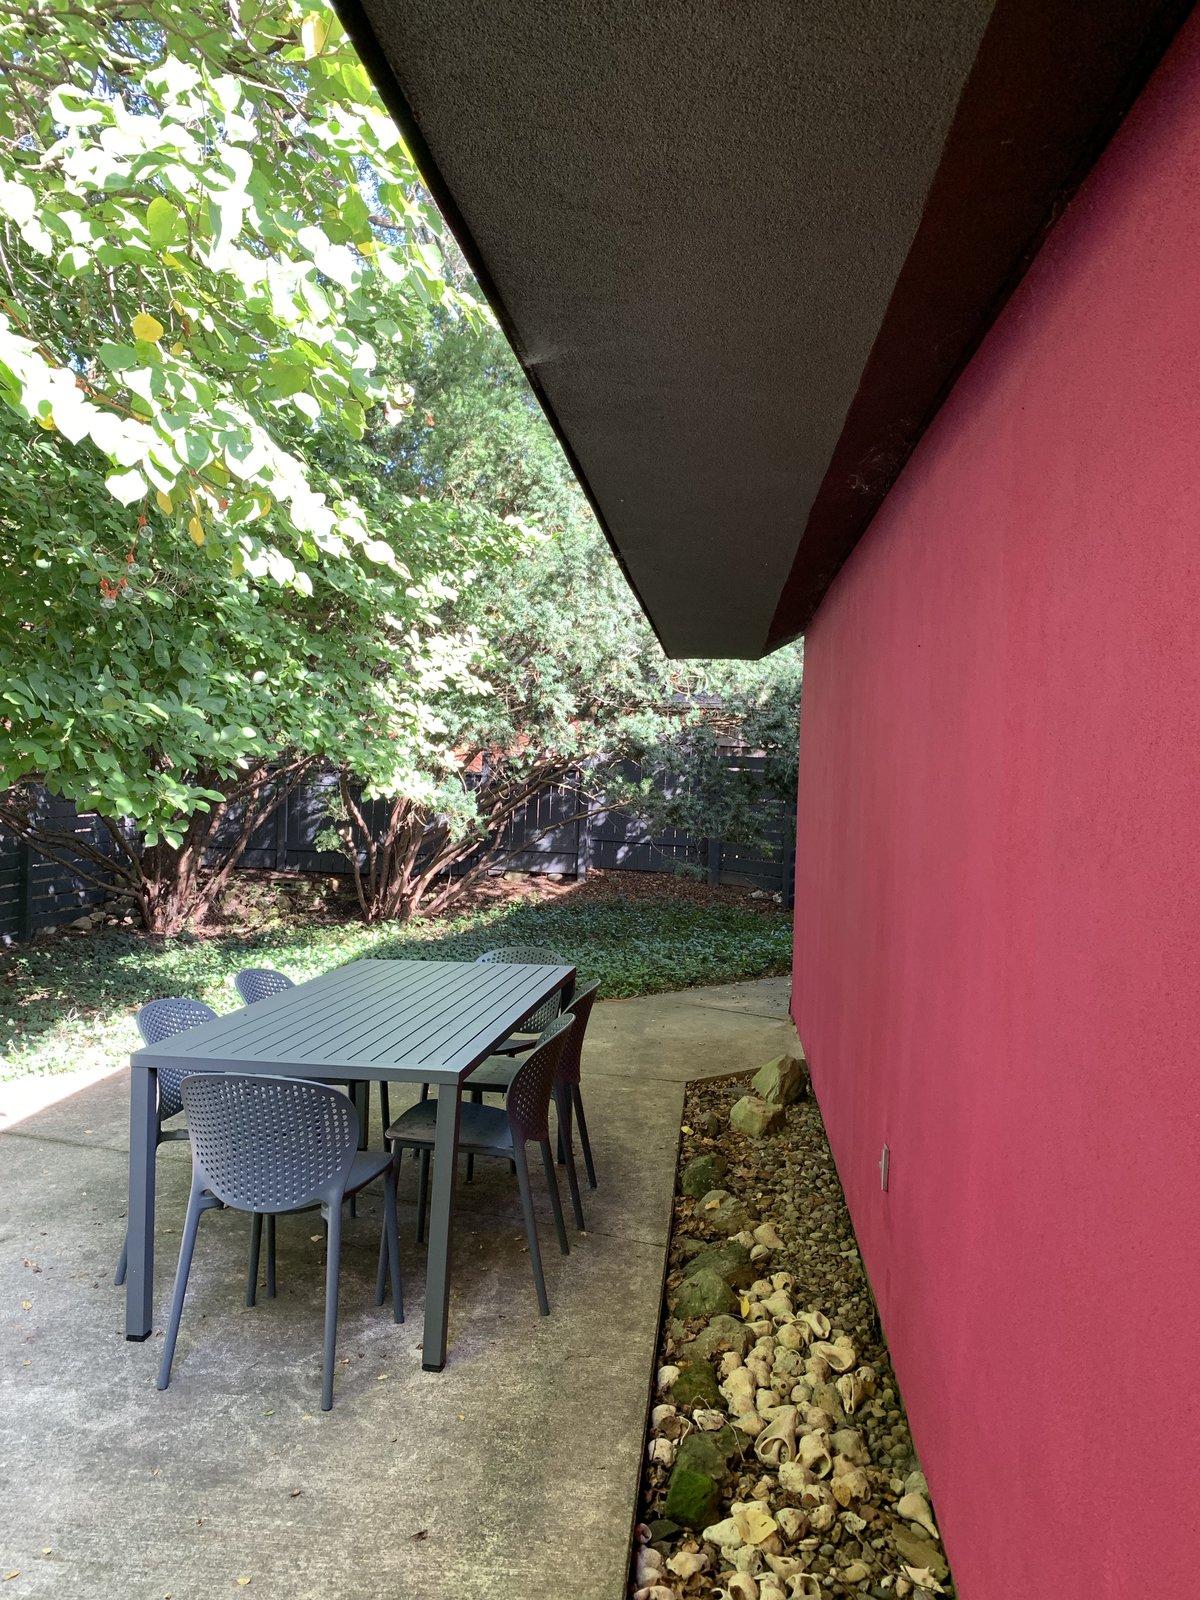 The Garden Path 2.0 by Jennifer Ott